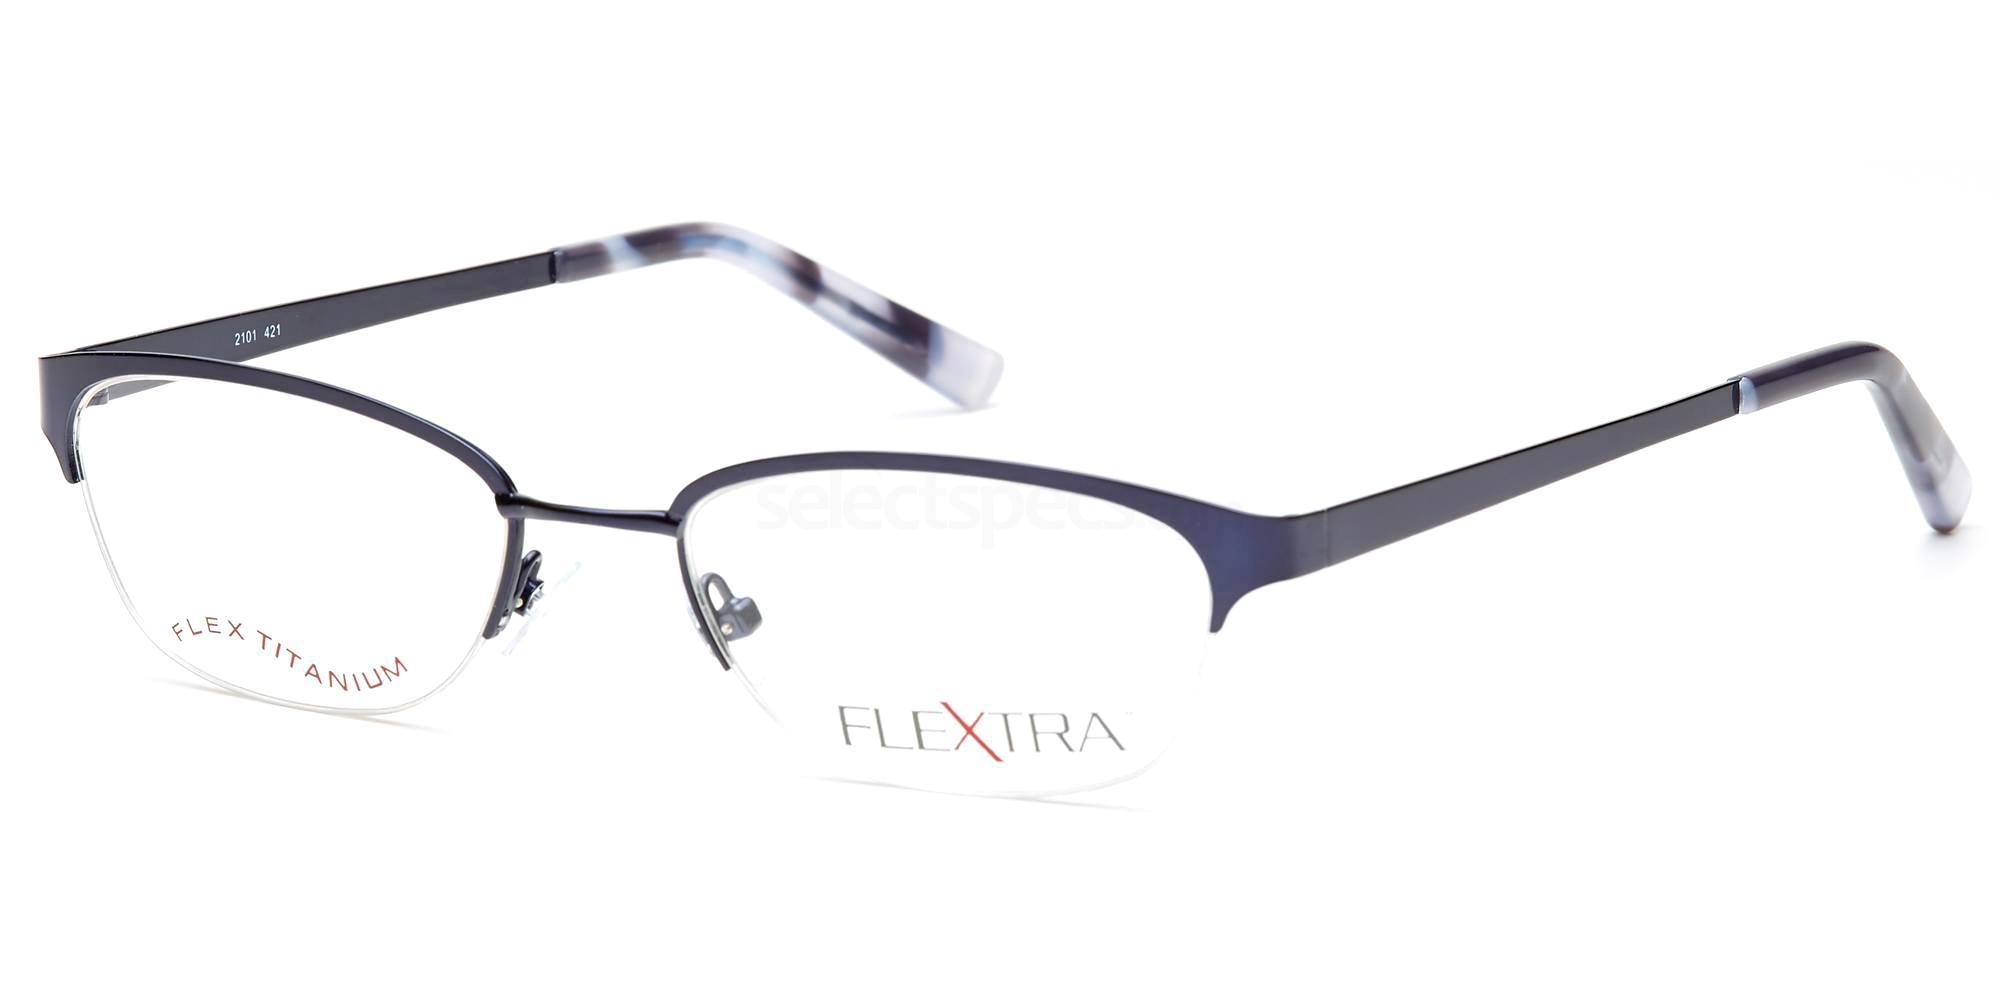 C1 FLX2101 Glasses, Flextra